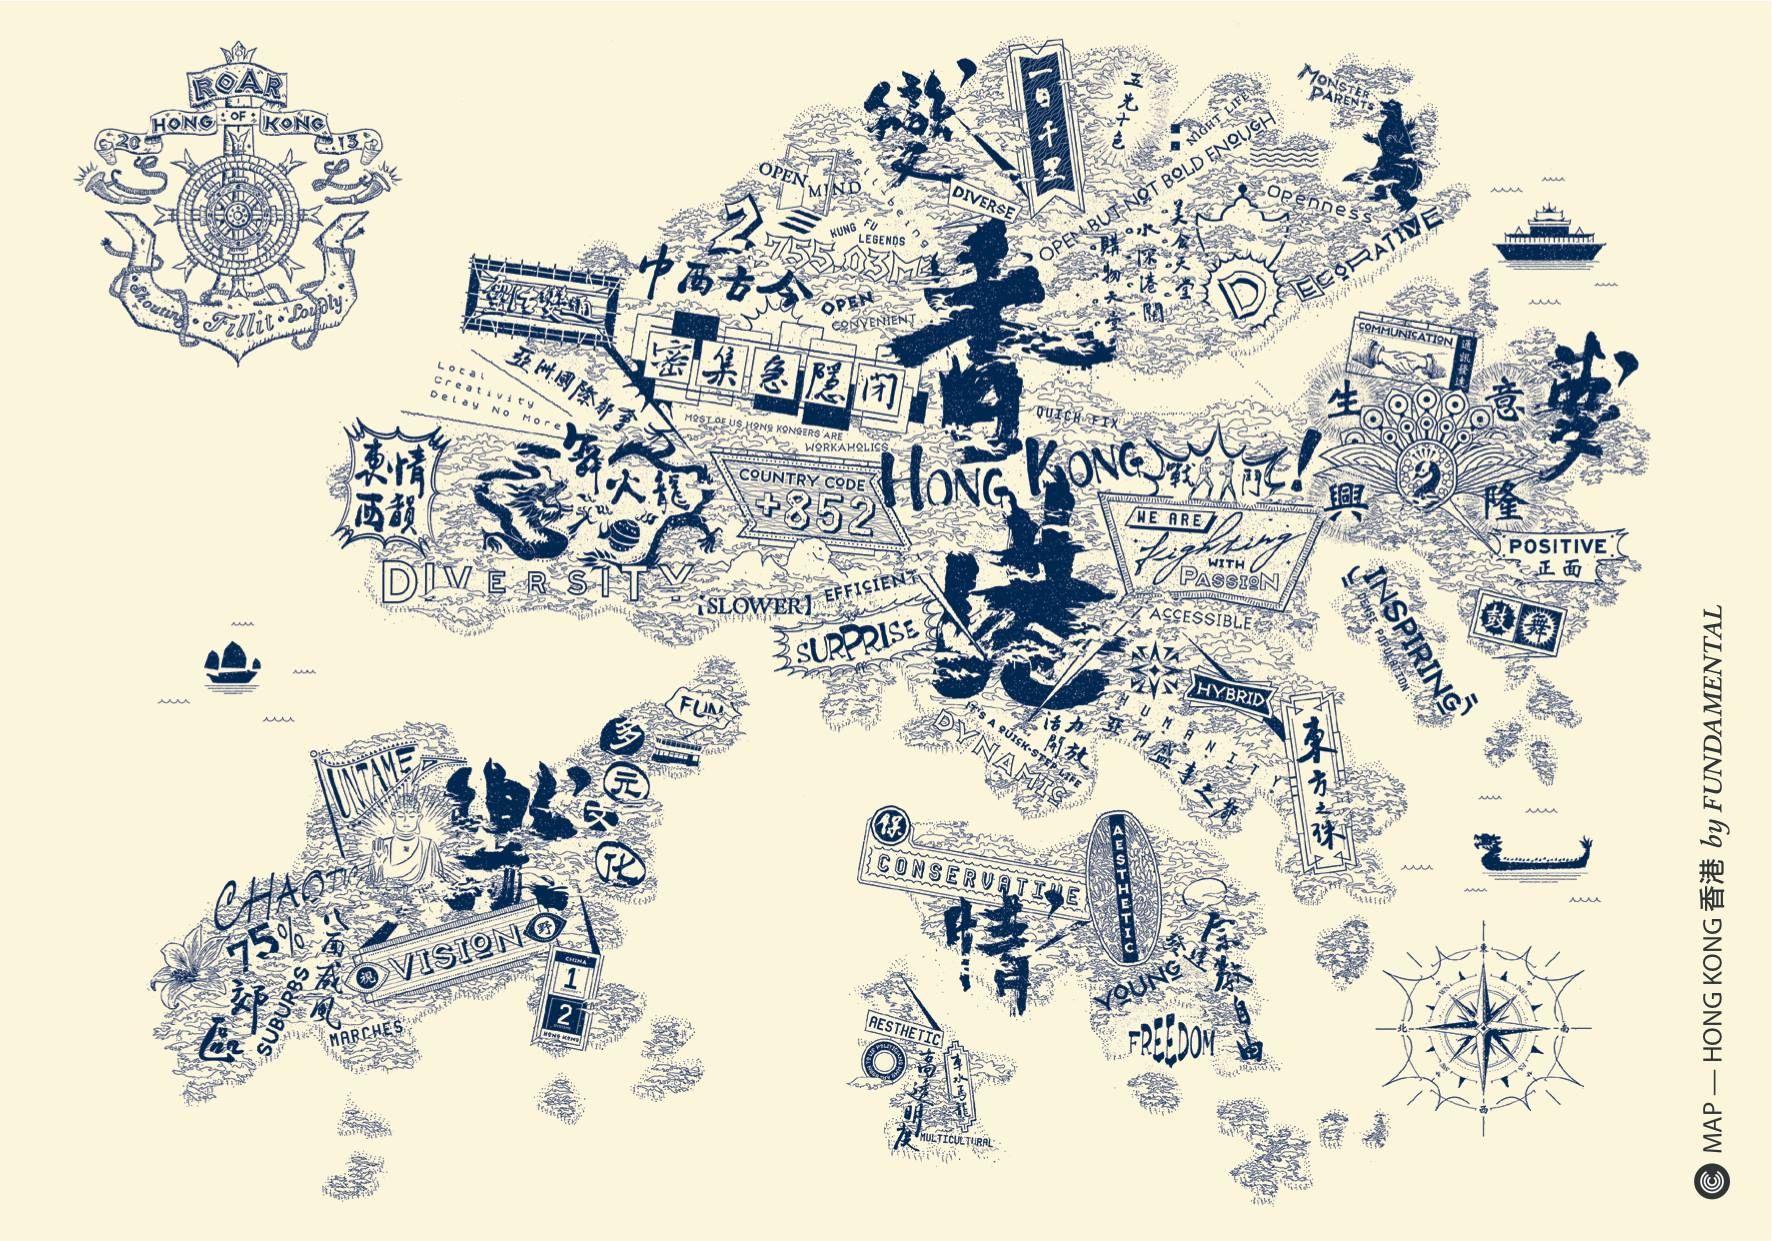 CREATIVE©ITIES invited 10 City Illustrators to create a graphical on creative consultant, creative marketing, creative photoshop, creative teacher, creative animation, creative painting, creative print, creative illustration, creative art, creative logo design, creative student, creative photography,